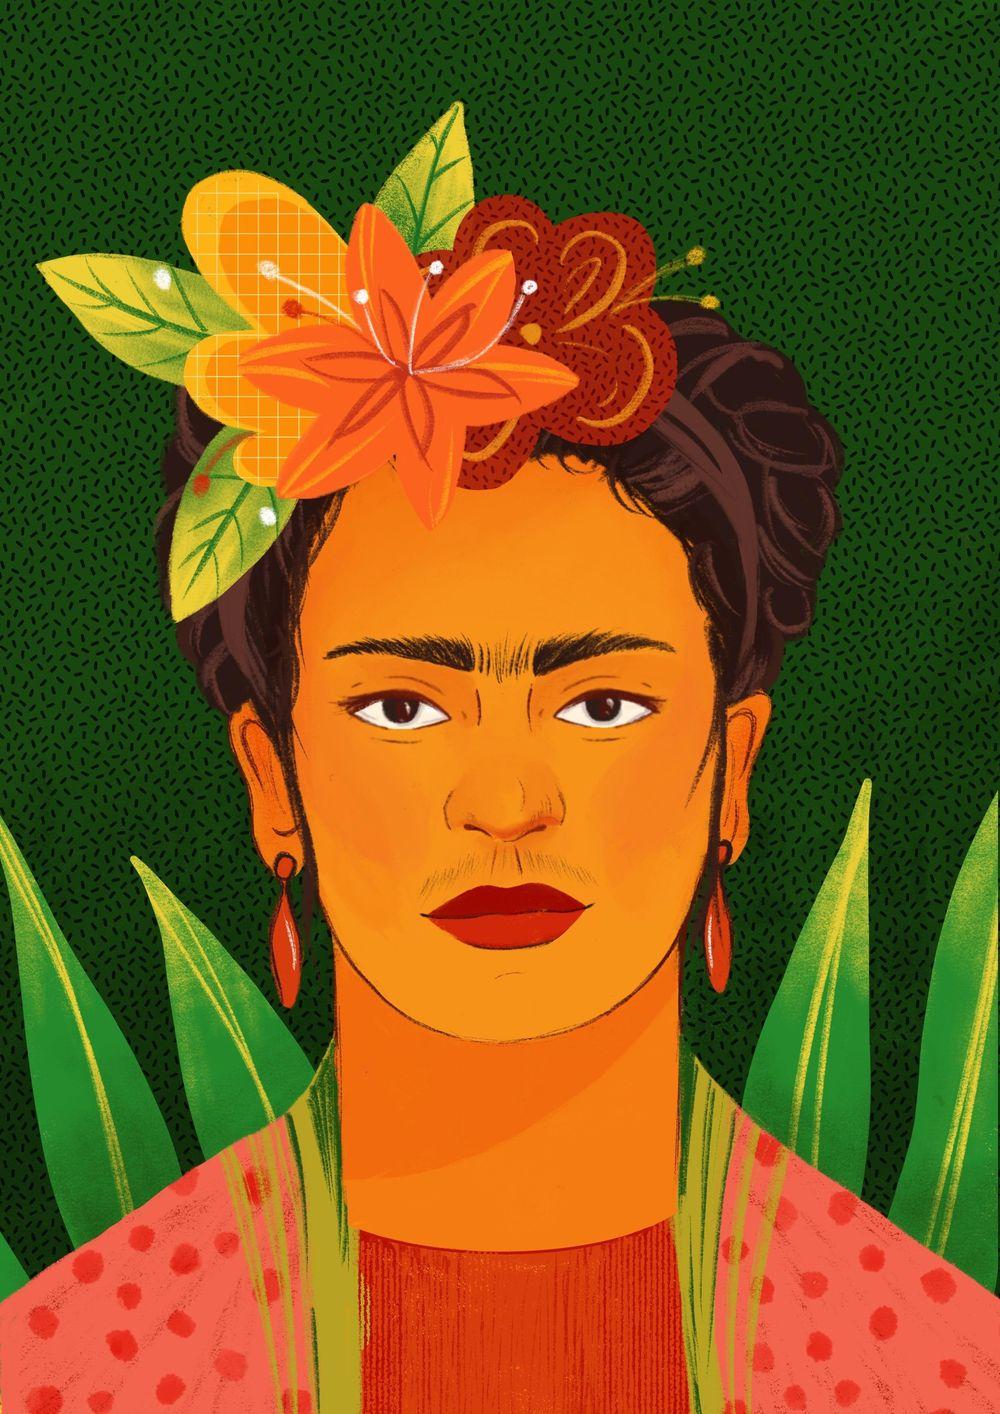 Daniela Ferreira - image 1 - student project